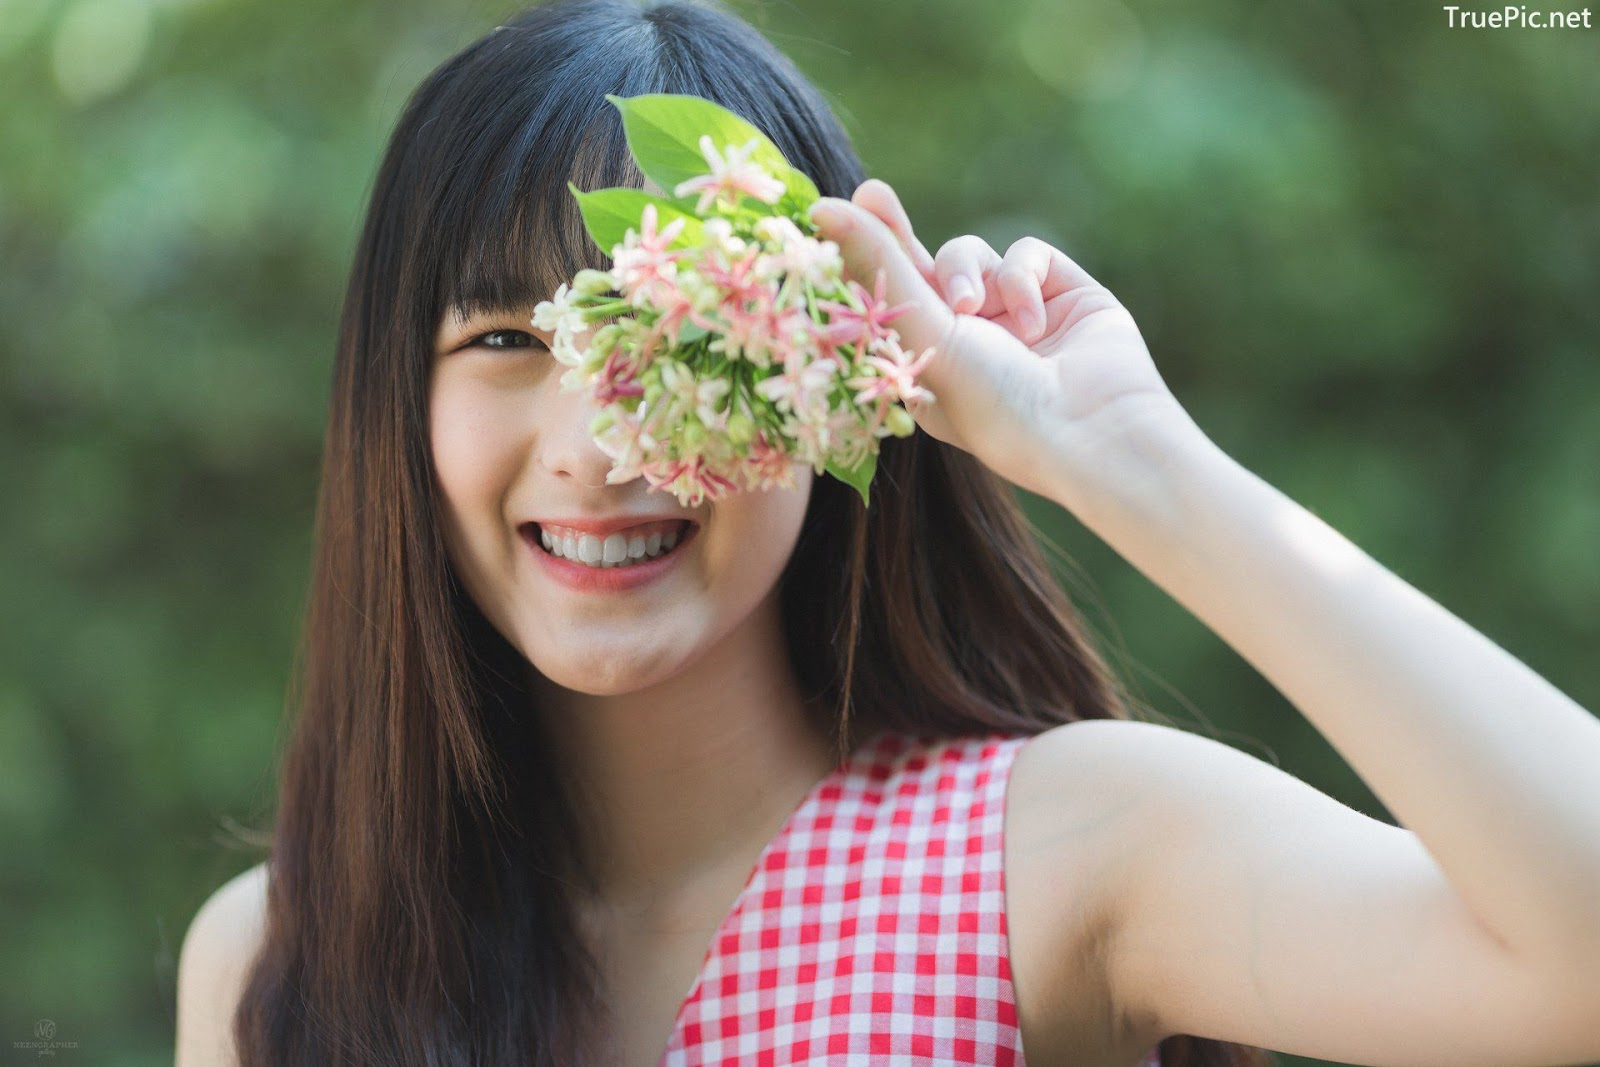 Image-Thailand-Cute-Model-Emma-Panisara–Album-Emma-Bright-Sunday-TruePic.net- Picture-22